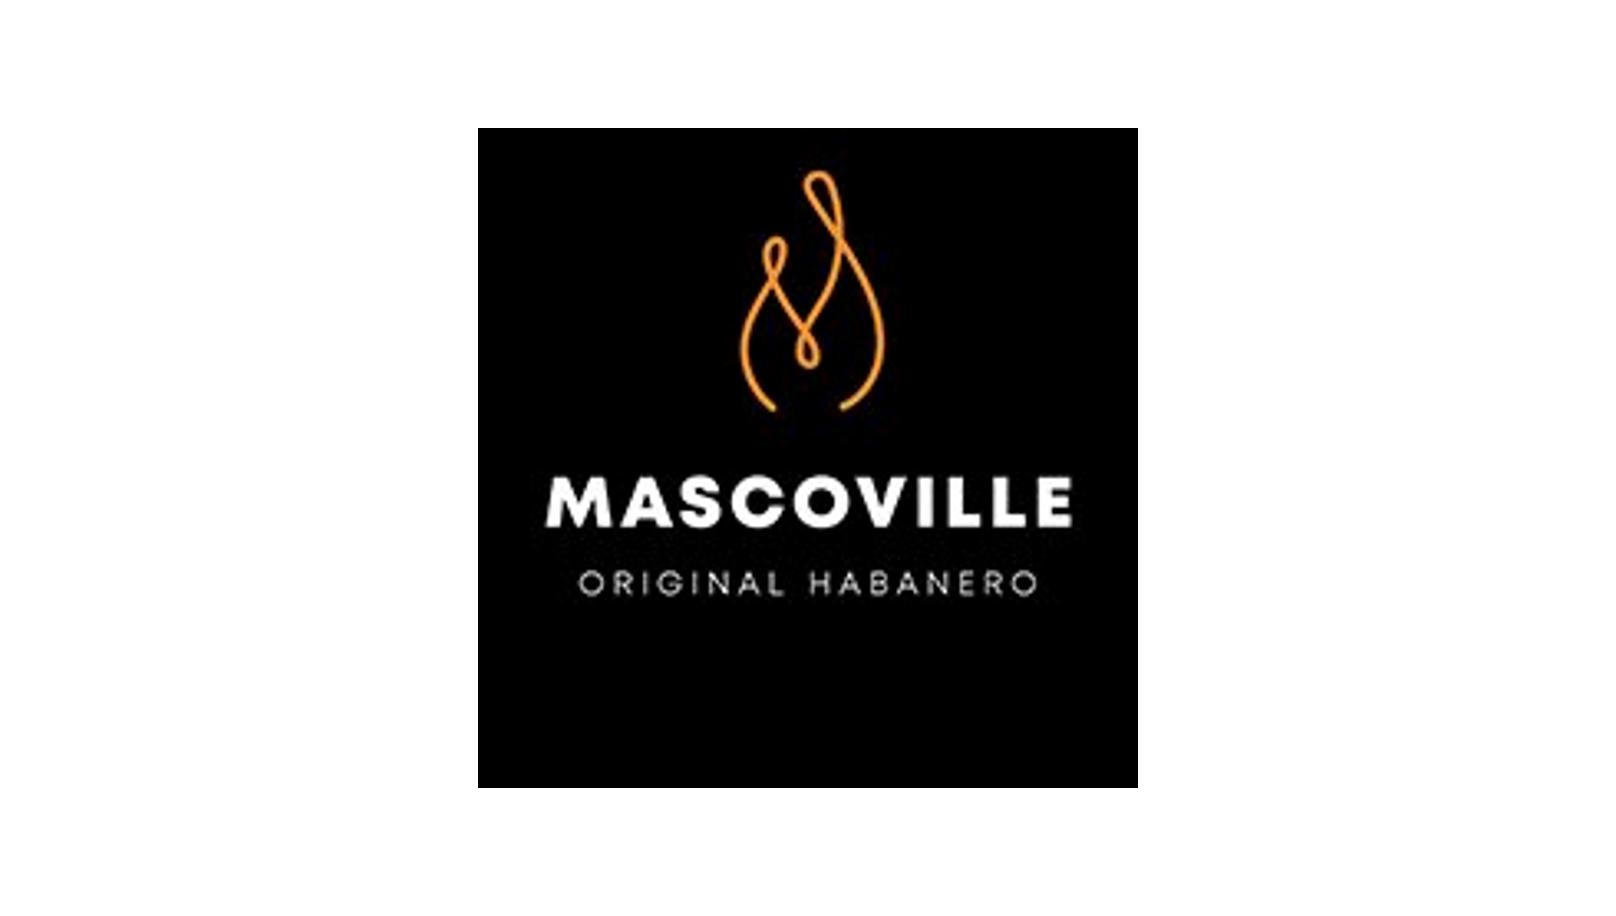 Mascoville